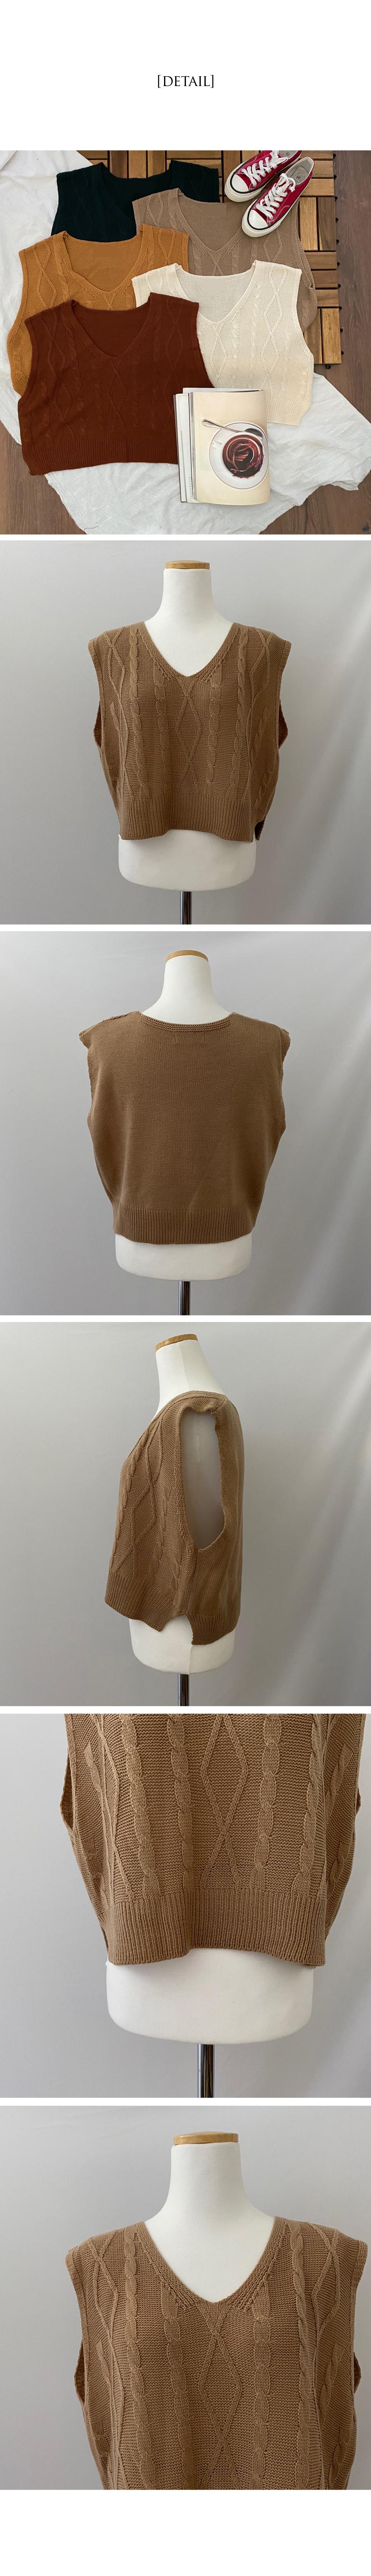 Just cropped knit vest vest